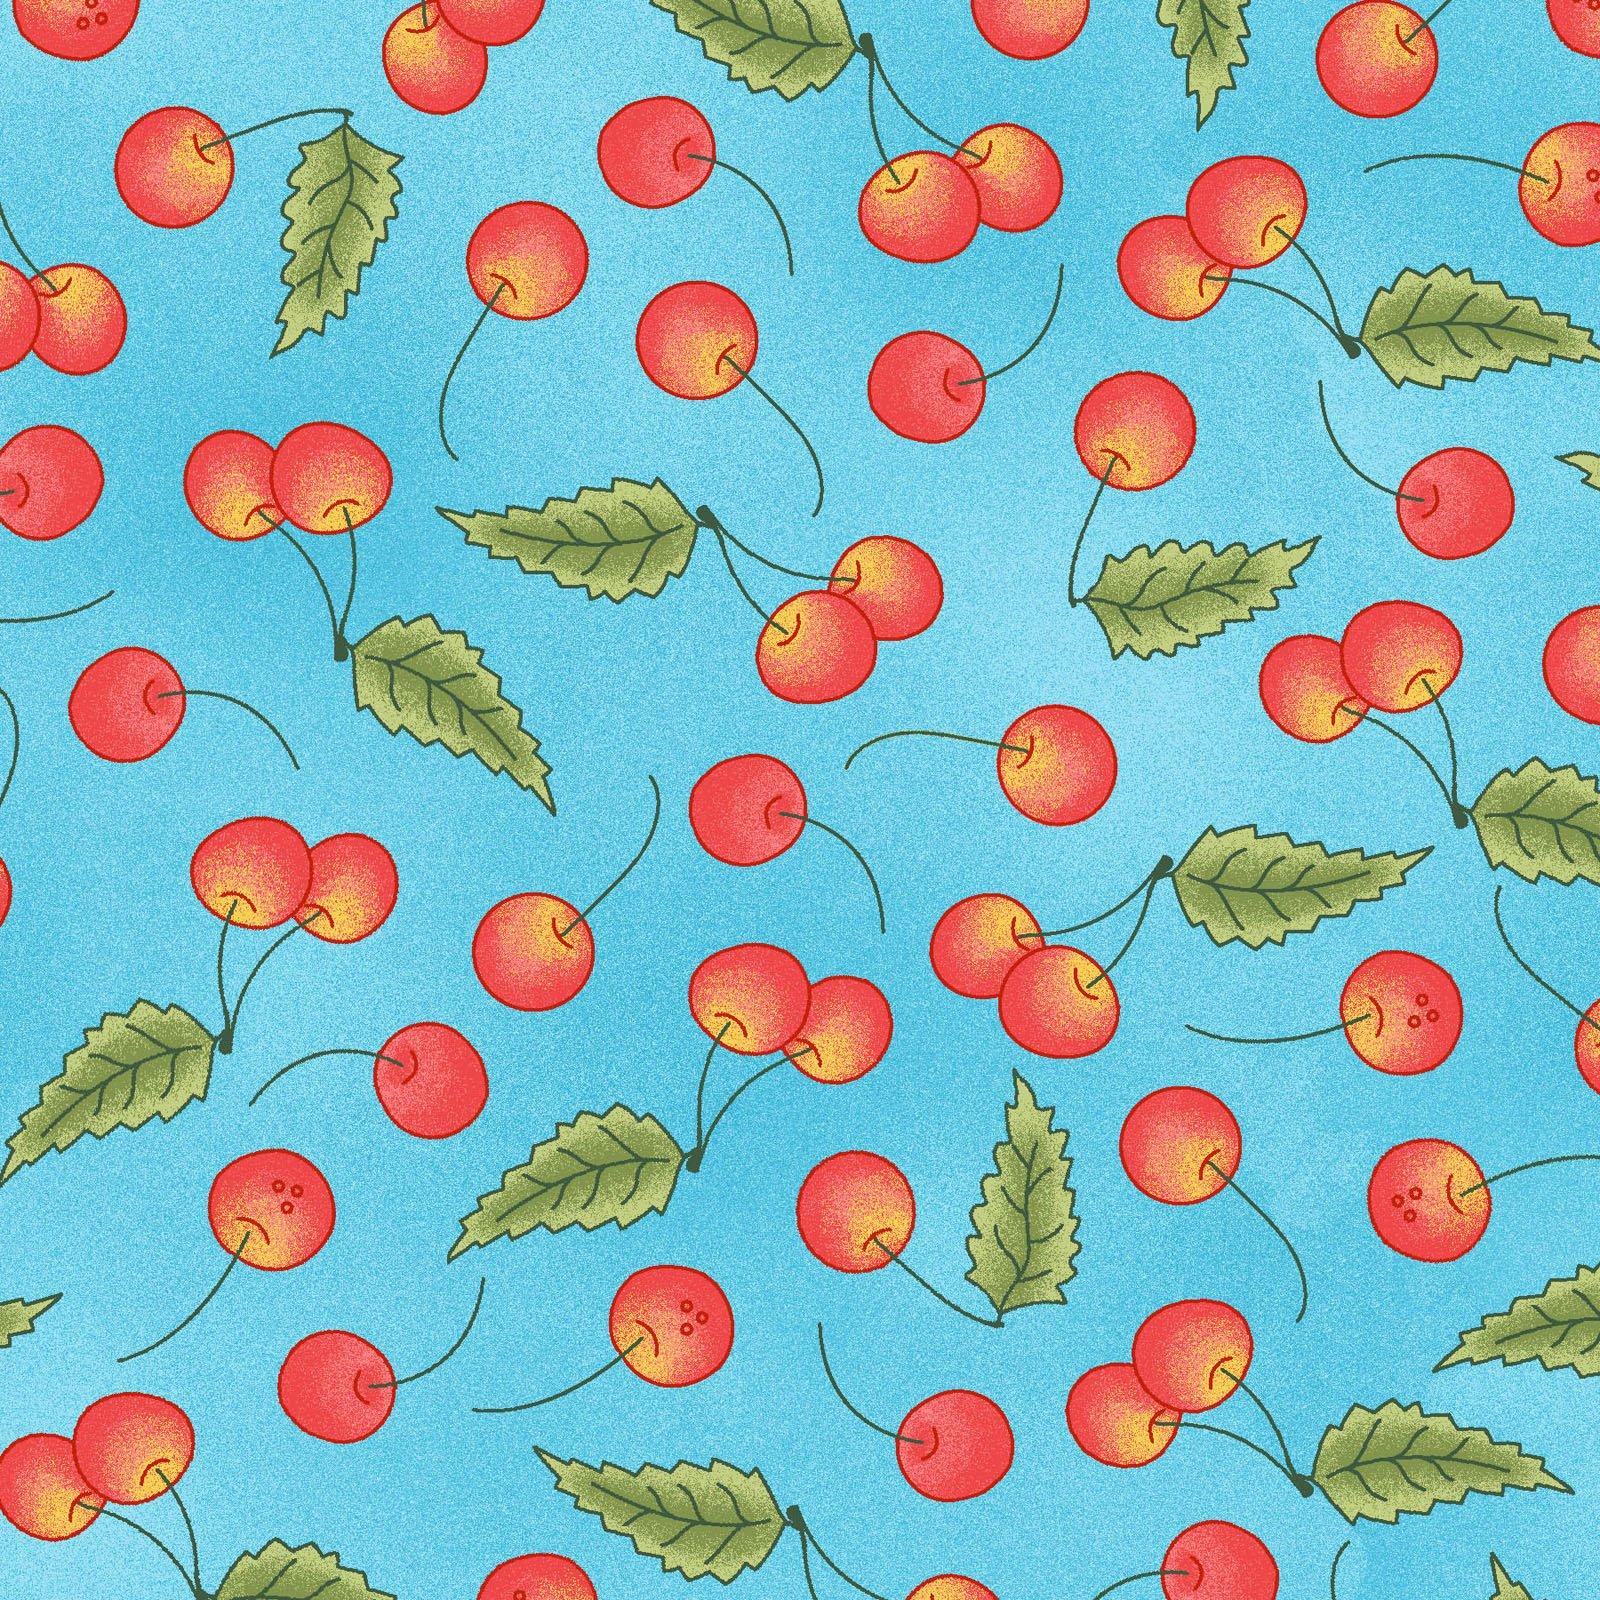 Back Porch Celebration - Cherries on Blue